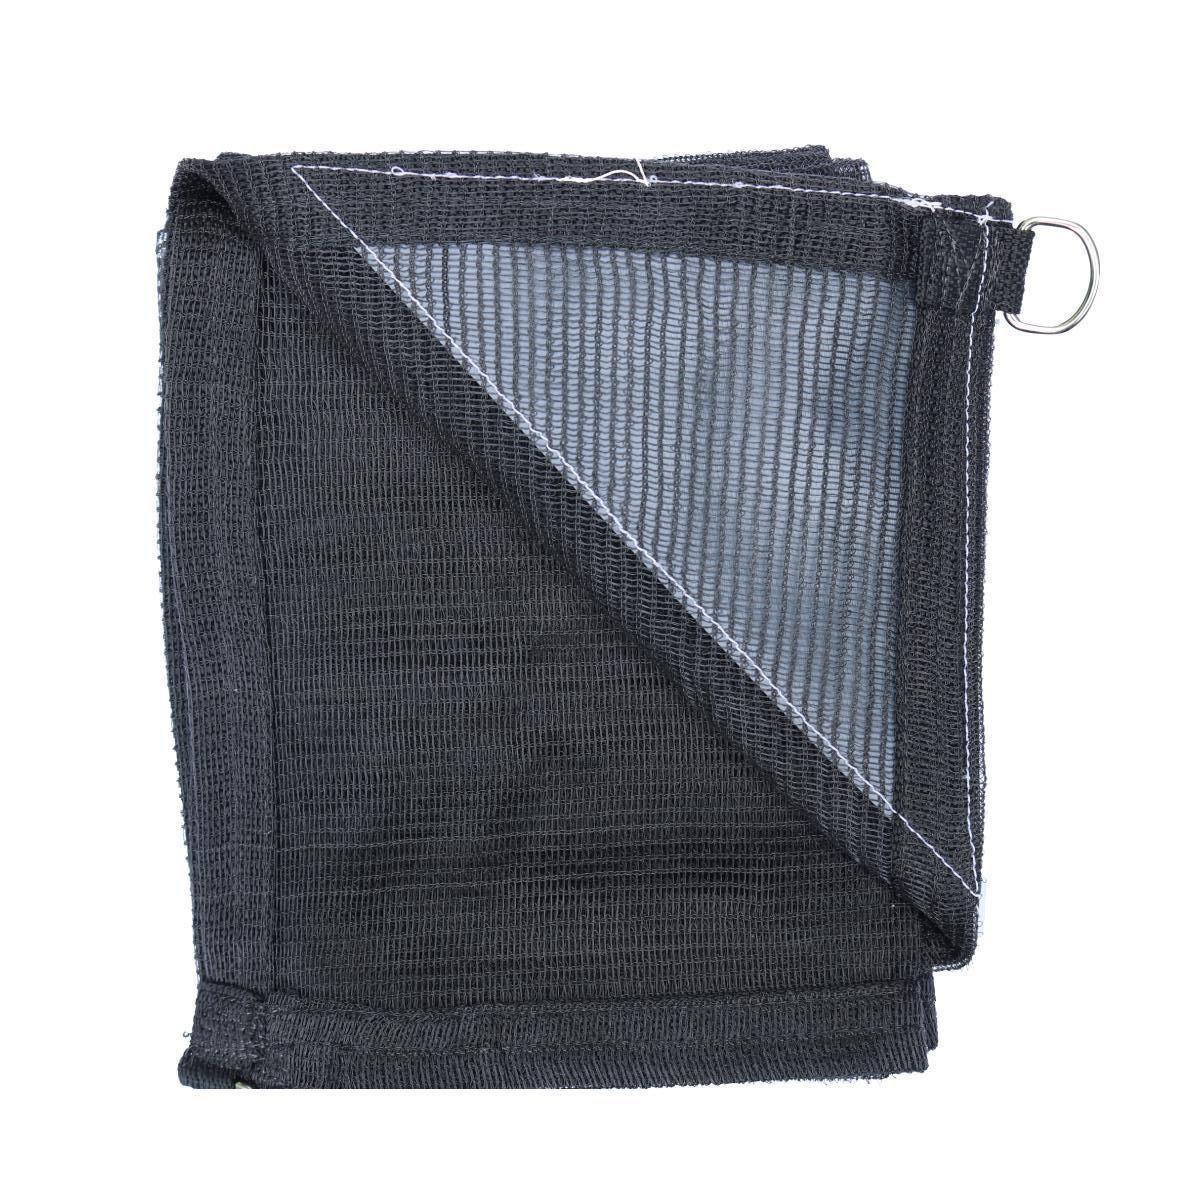 Sombrite 70 Multi Proteção 3m x 1,5m